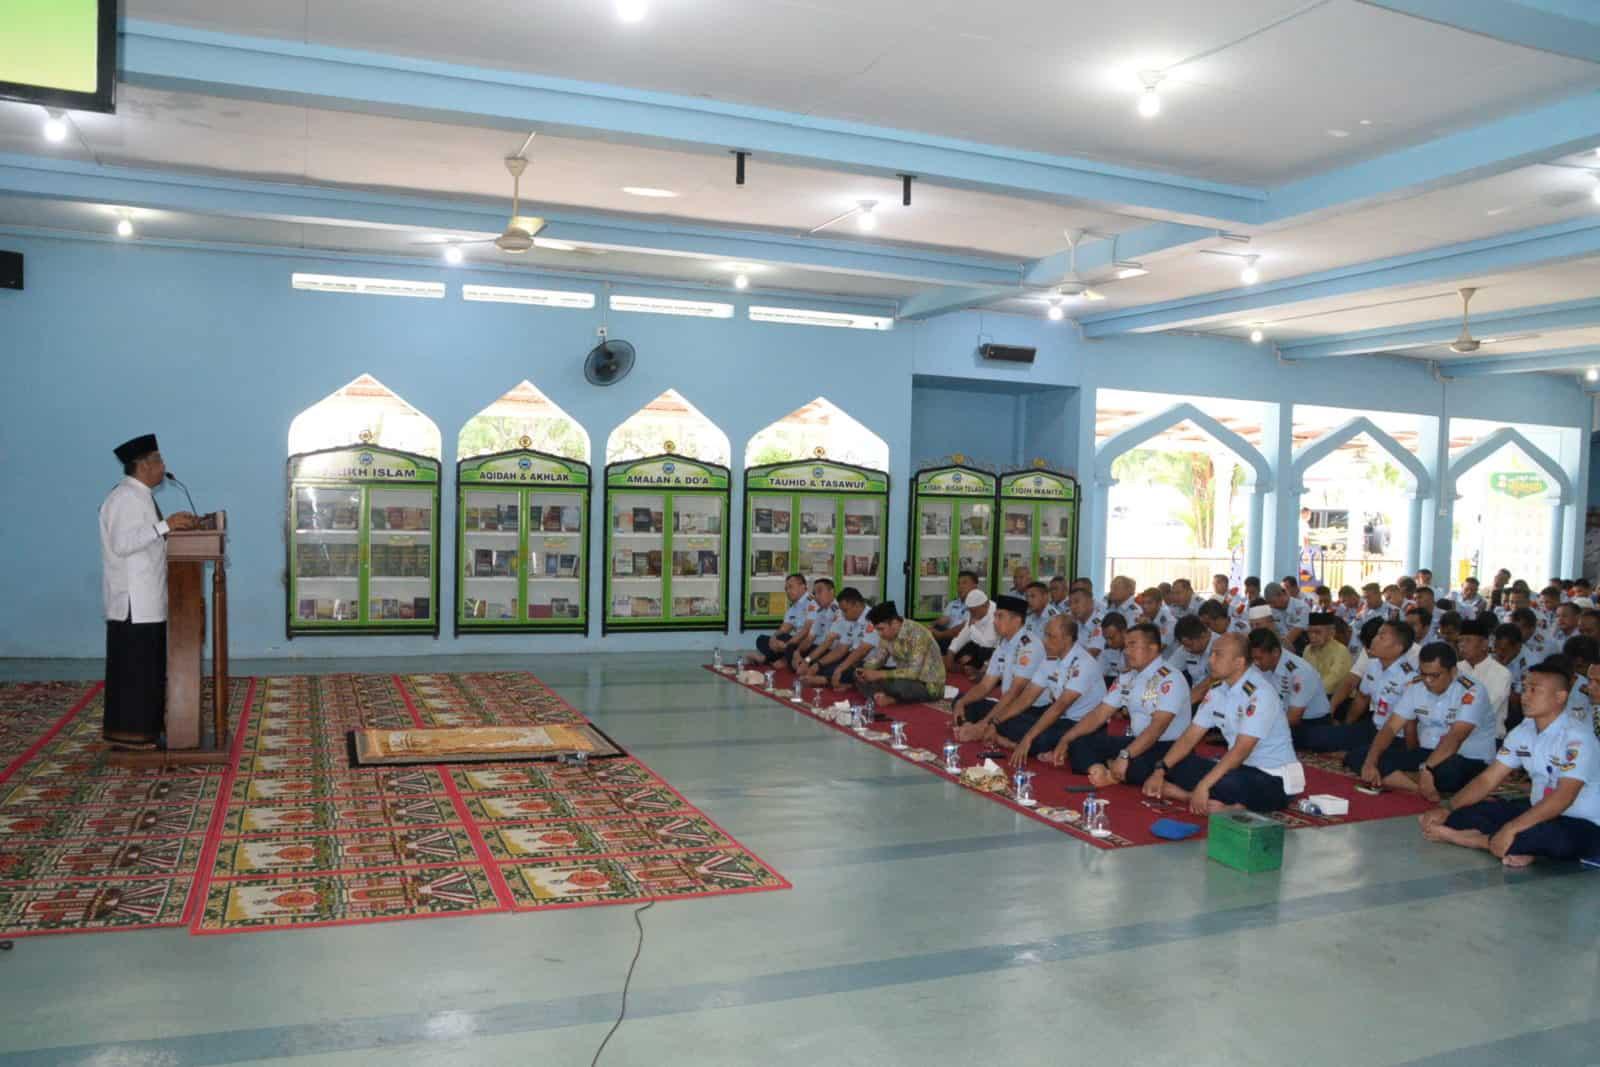 TNI AU Medan Bersama Peringati Maulid Nabi Muhammad SAW 1441 H / 2019 M